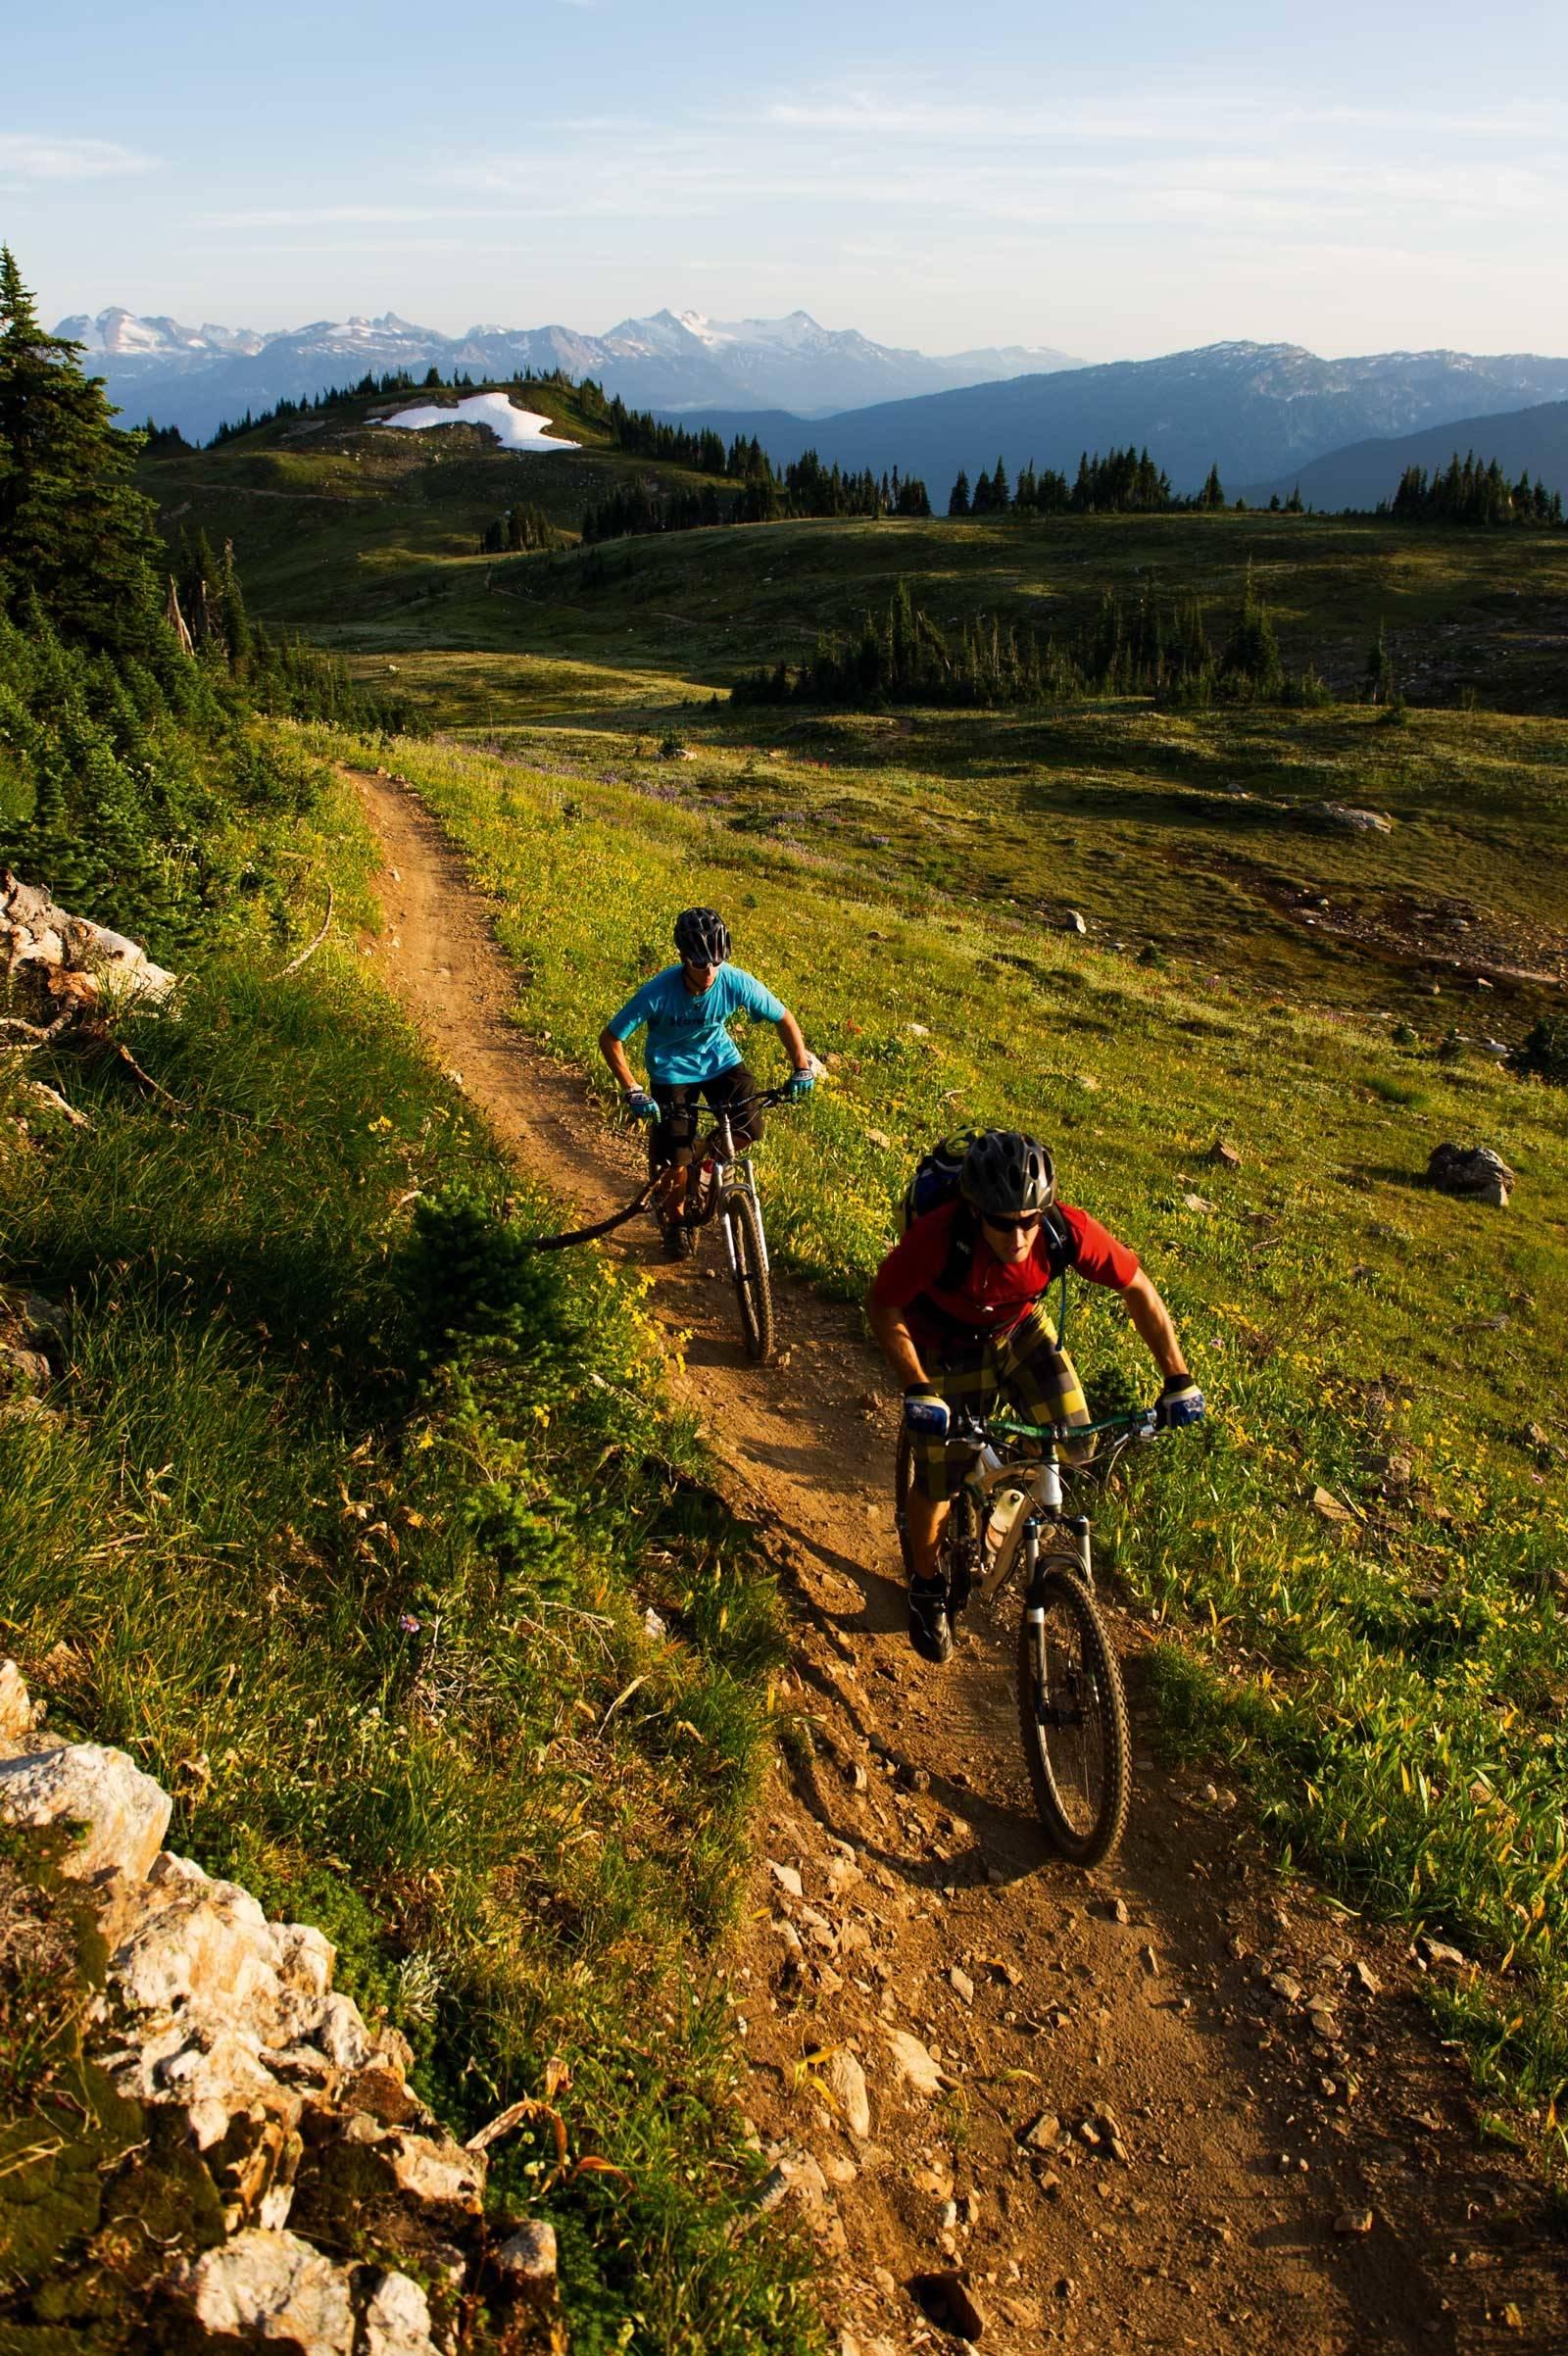 Stisykling-guide-British-Columbia-Revelstoke-2